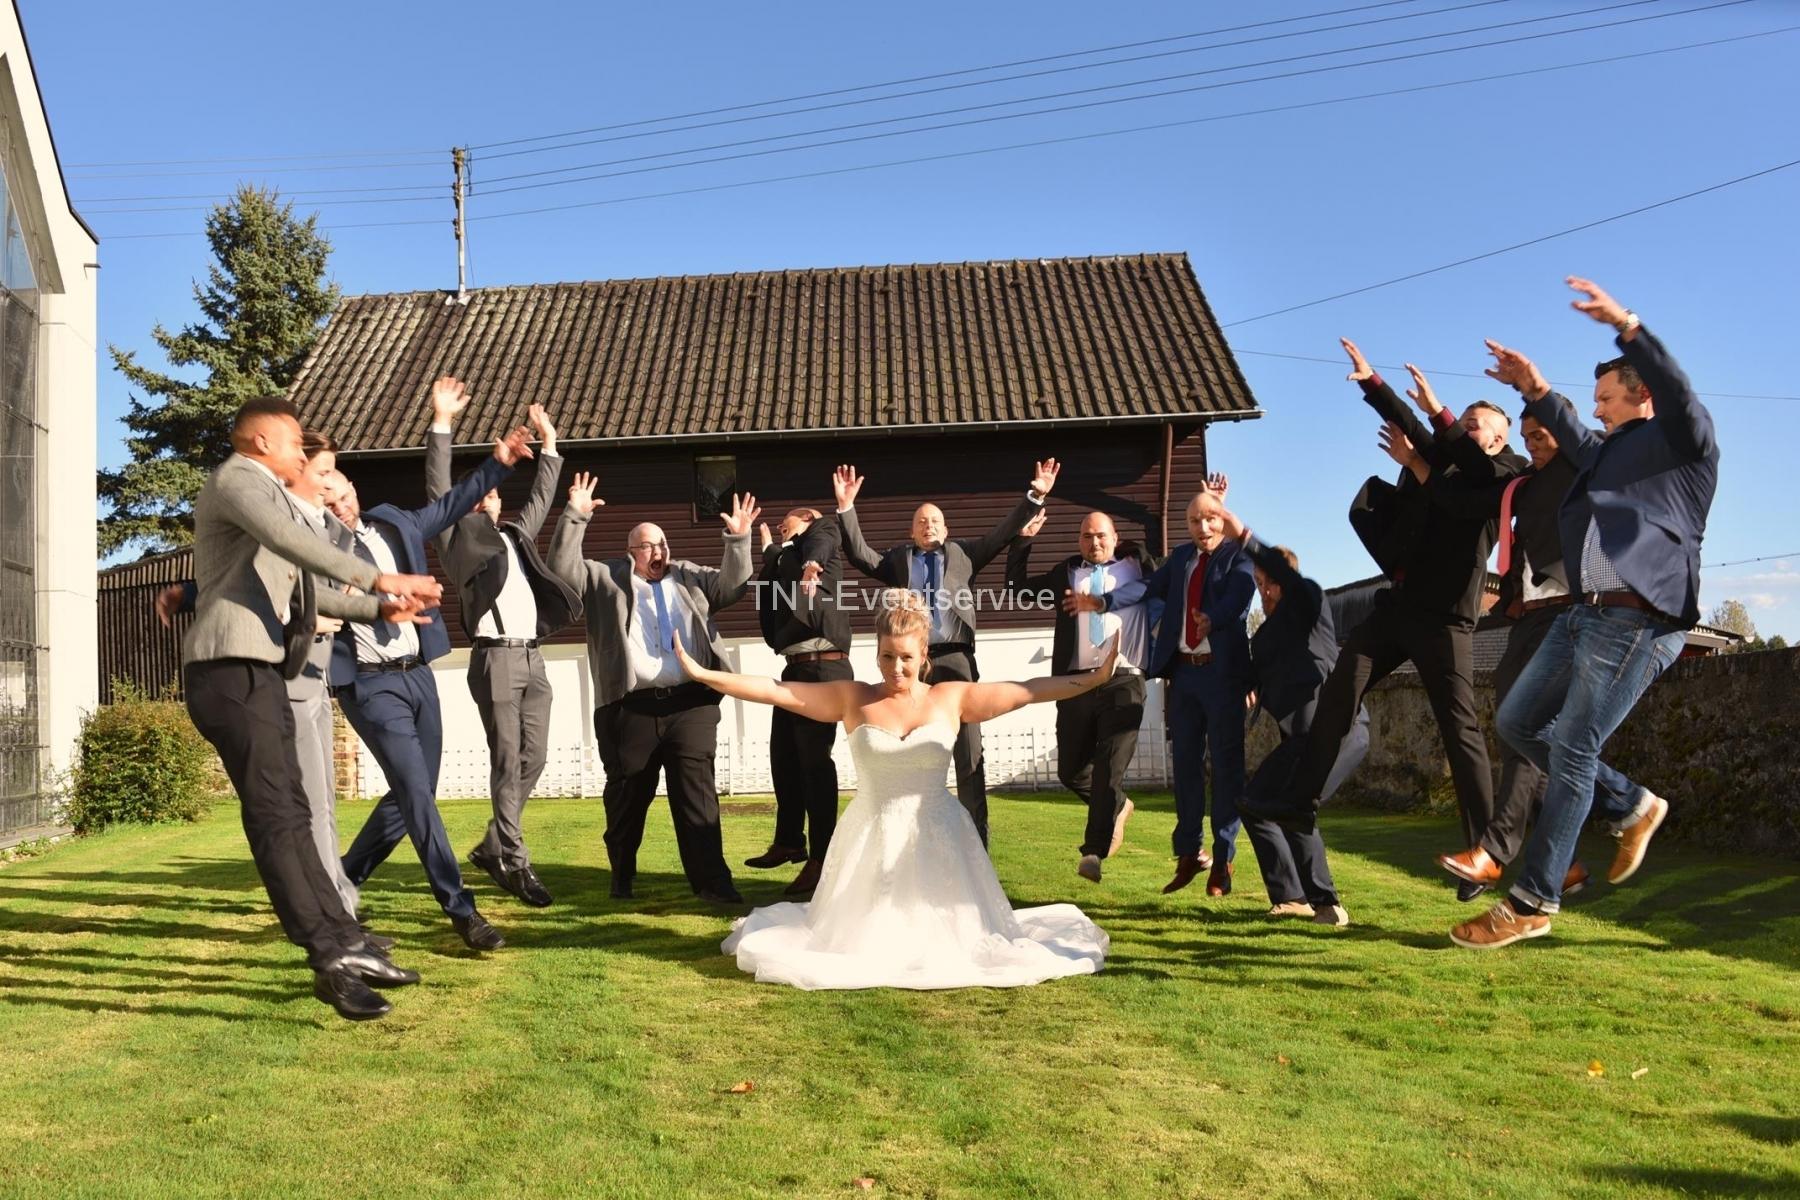 Hochzeitsshooting Keßler 14.10 (557) (Copy)